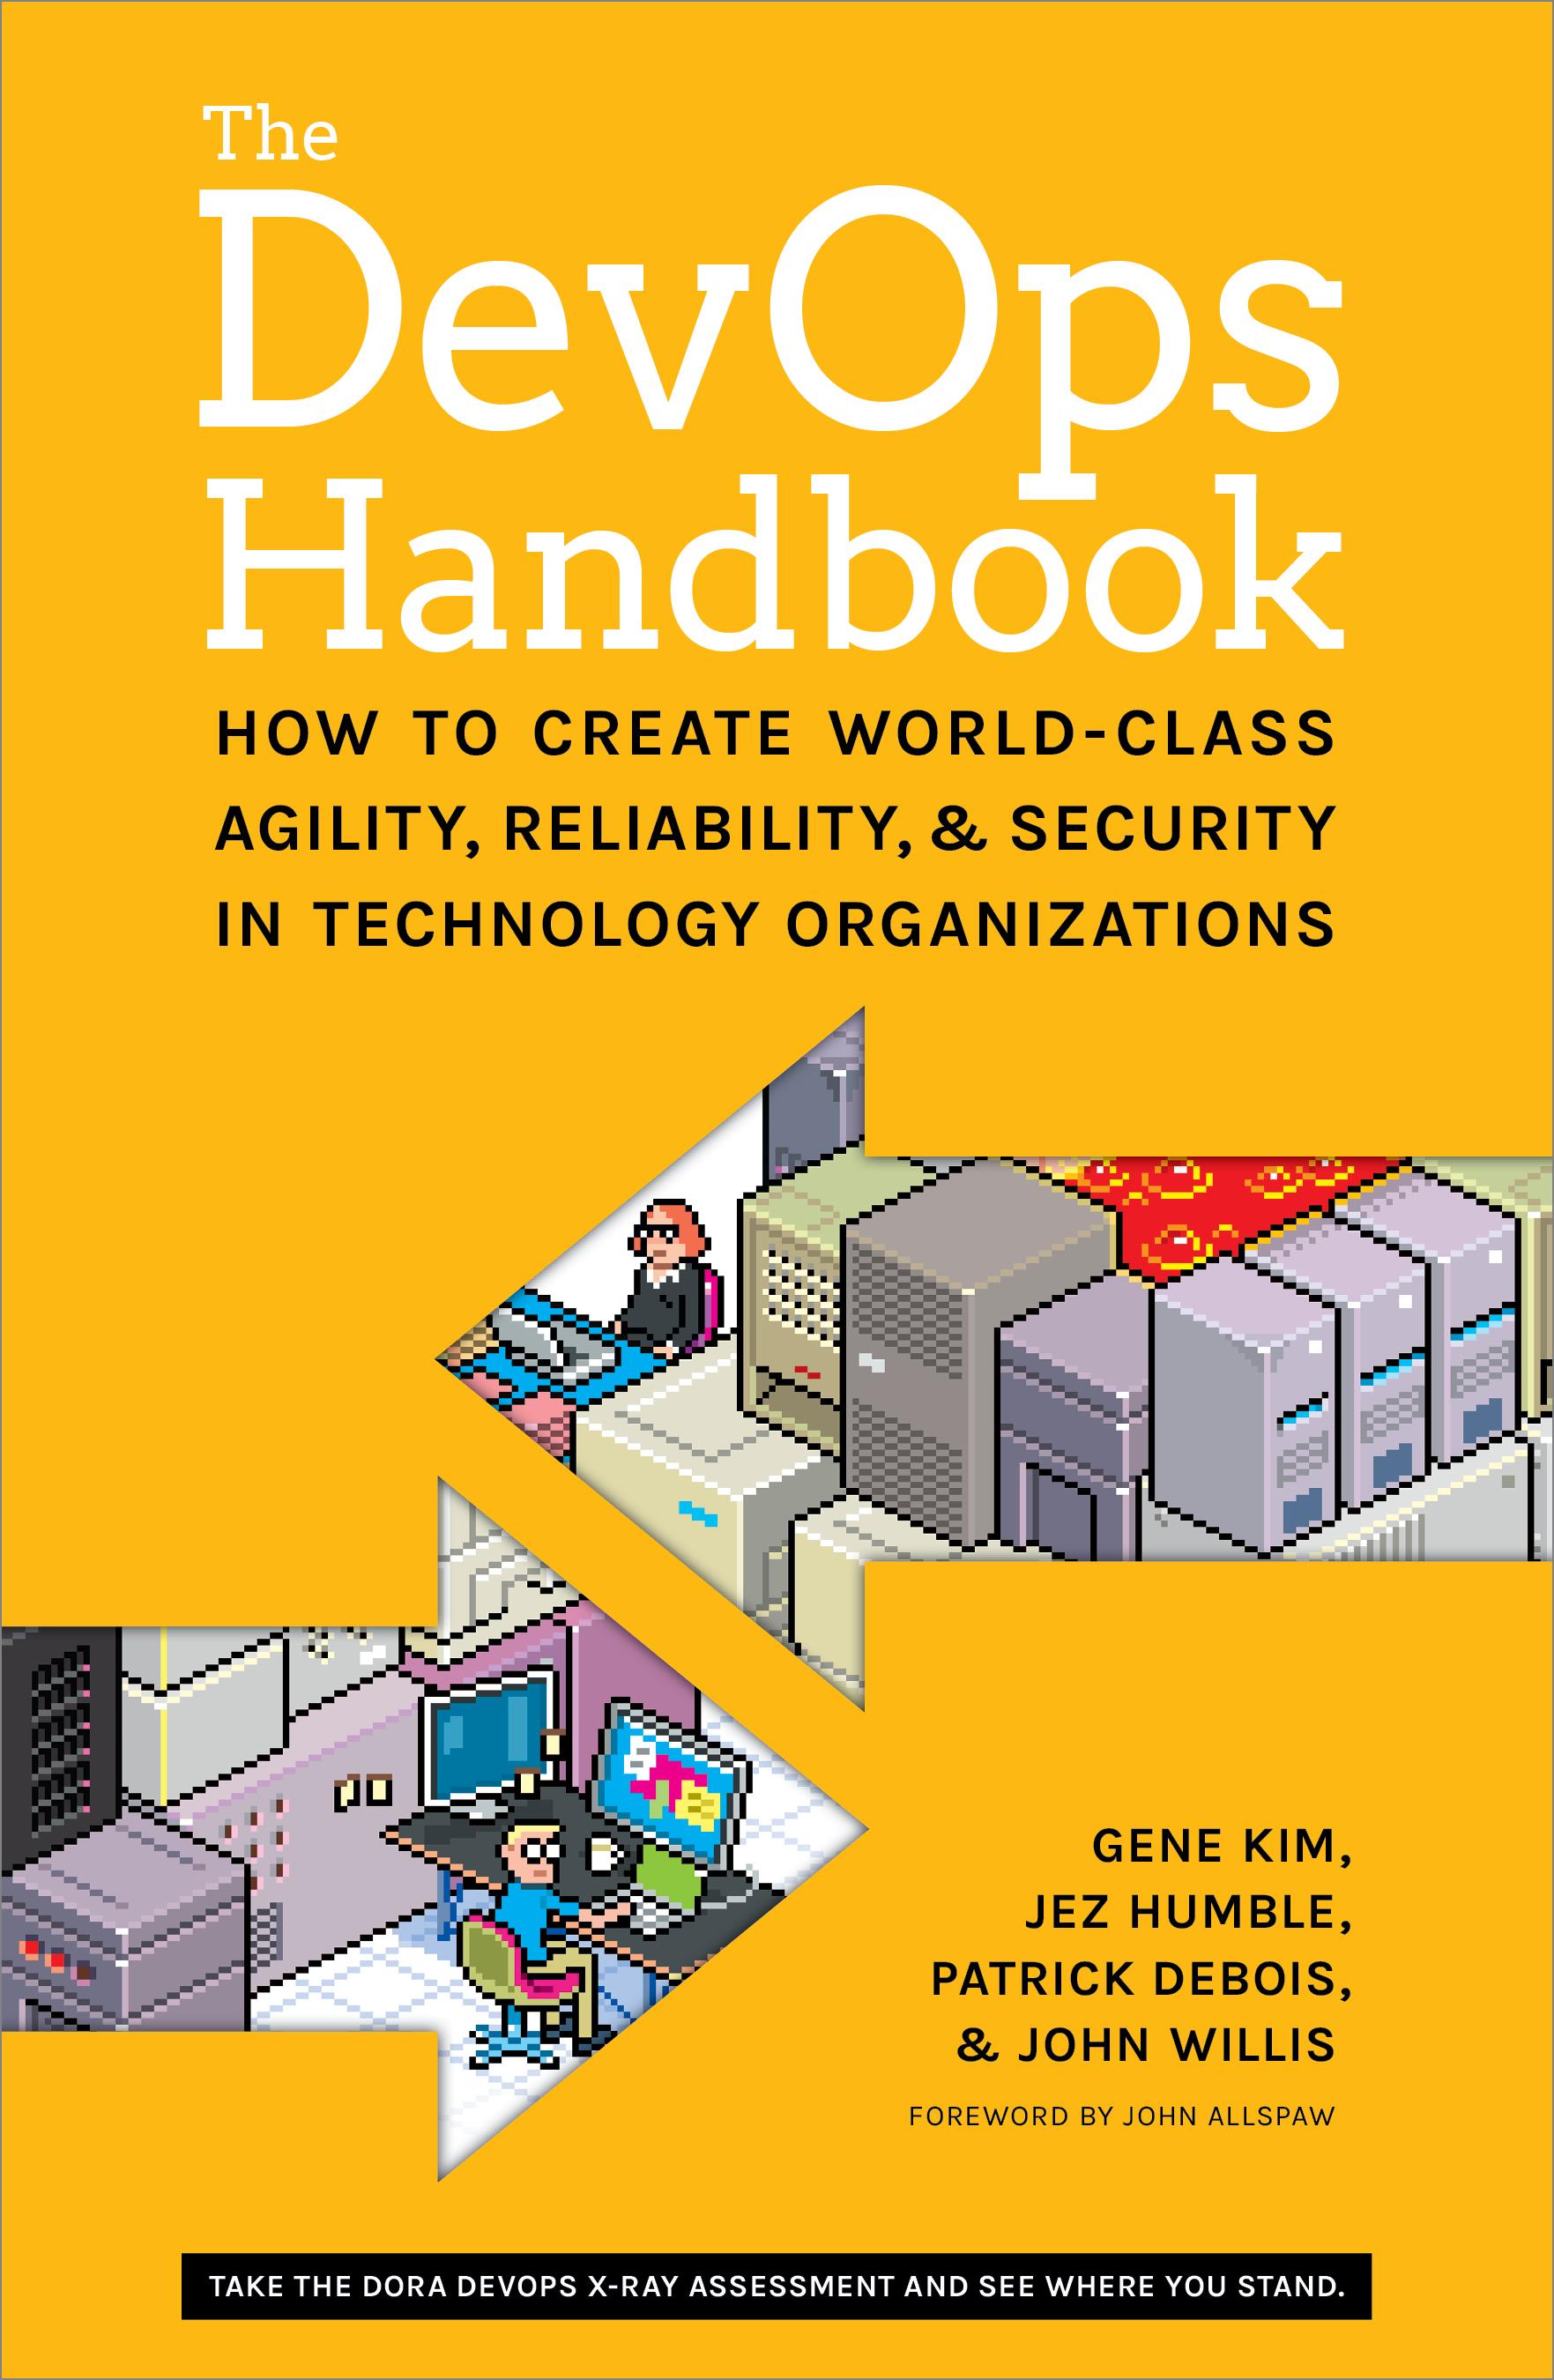 The DevOps Handbook by Gene Kim, Jez Humble, Patrick Debois, and John Willis